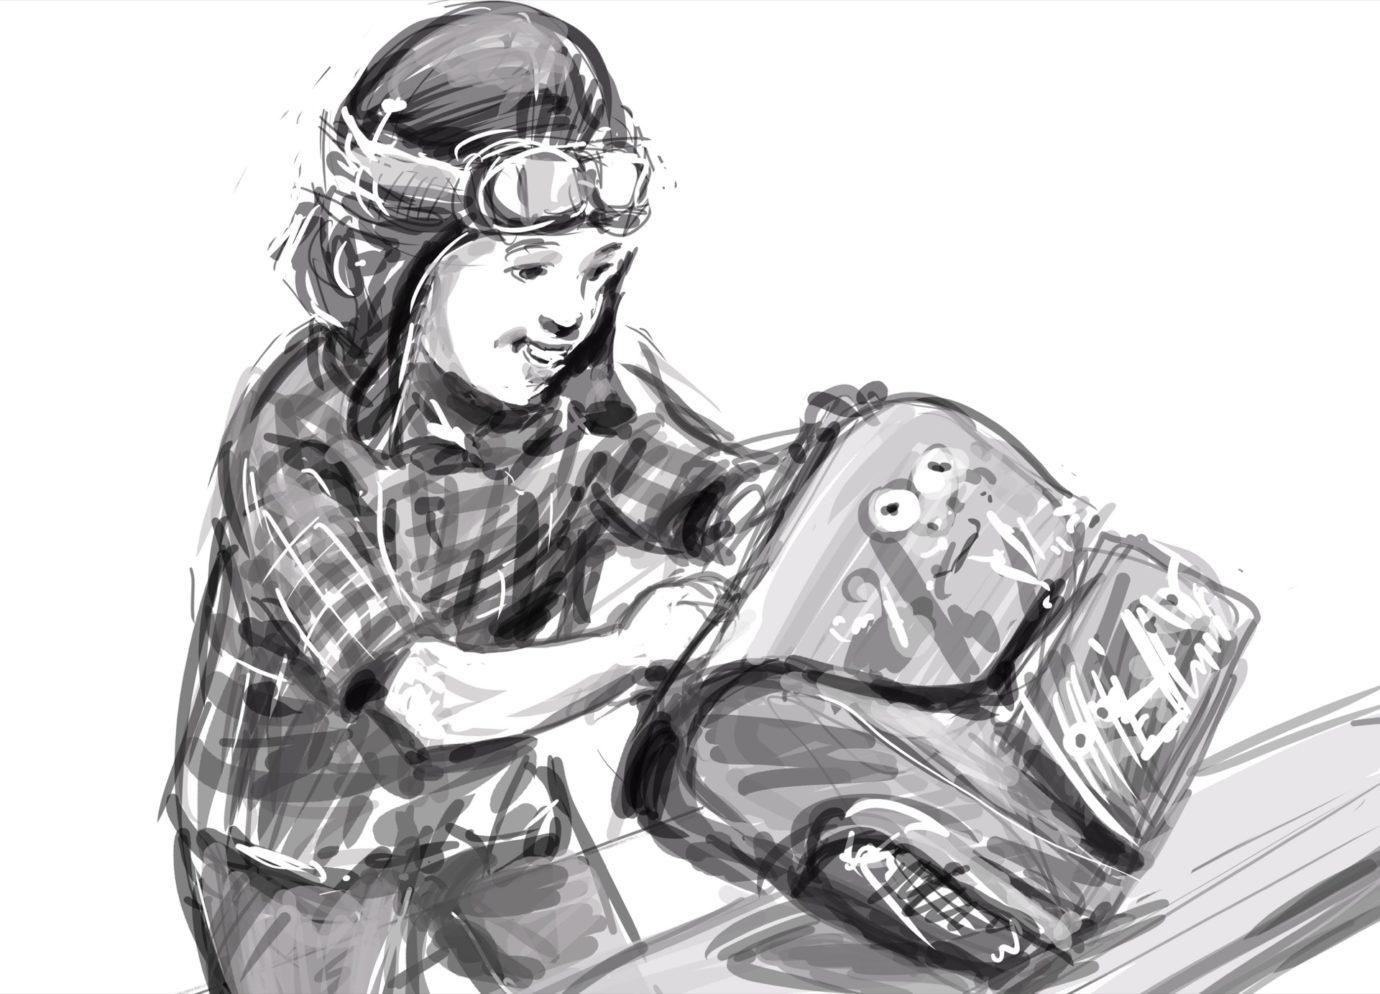 ilustracje / storyboardy